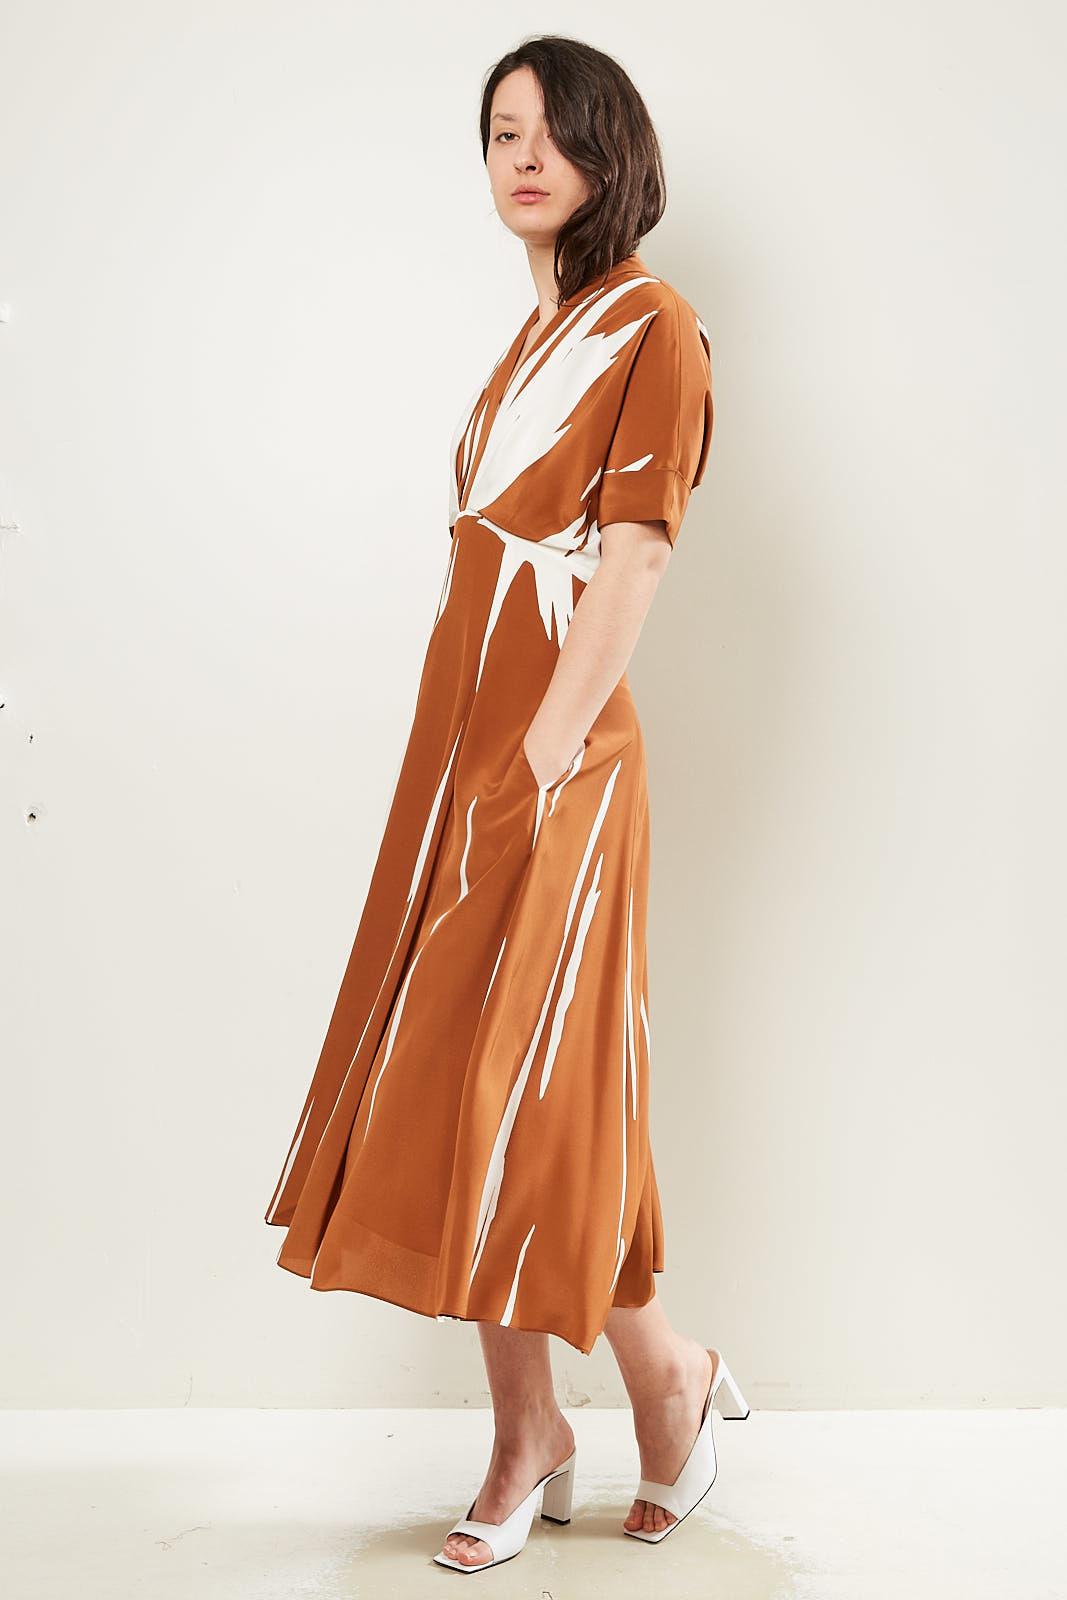 Paul Smith - womens dress